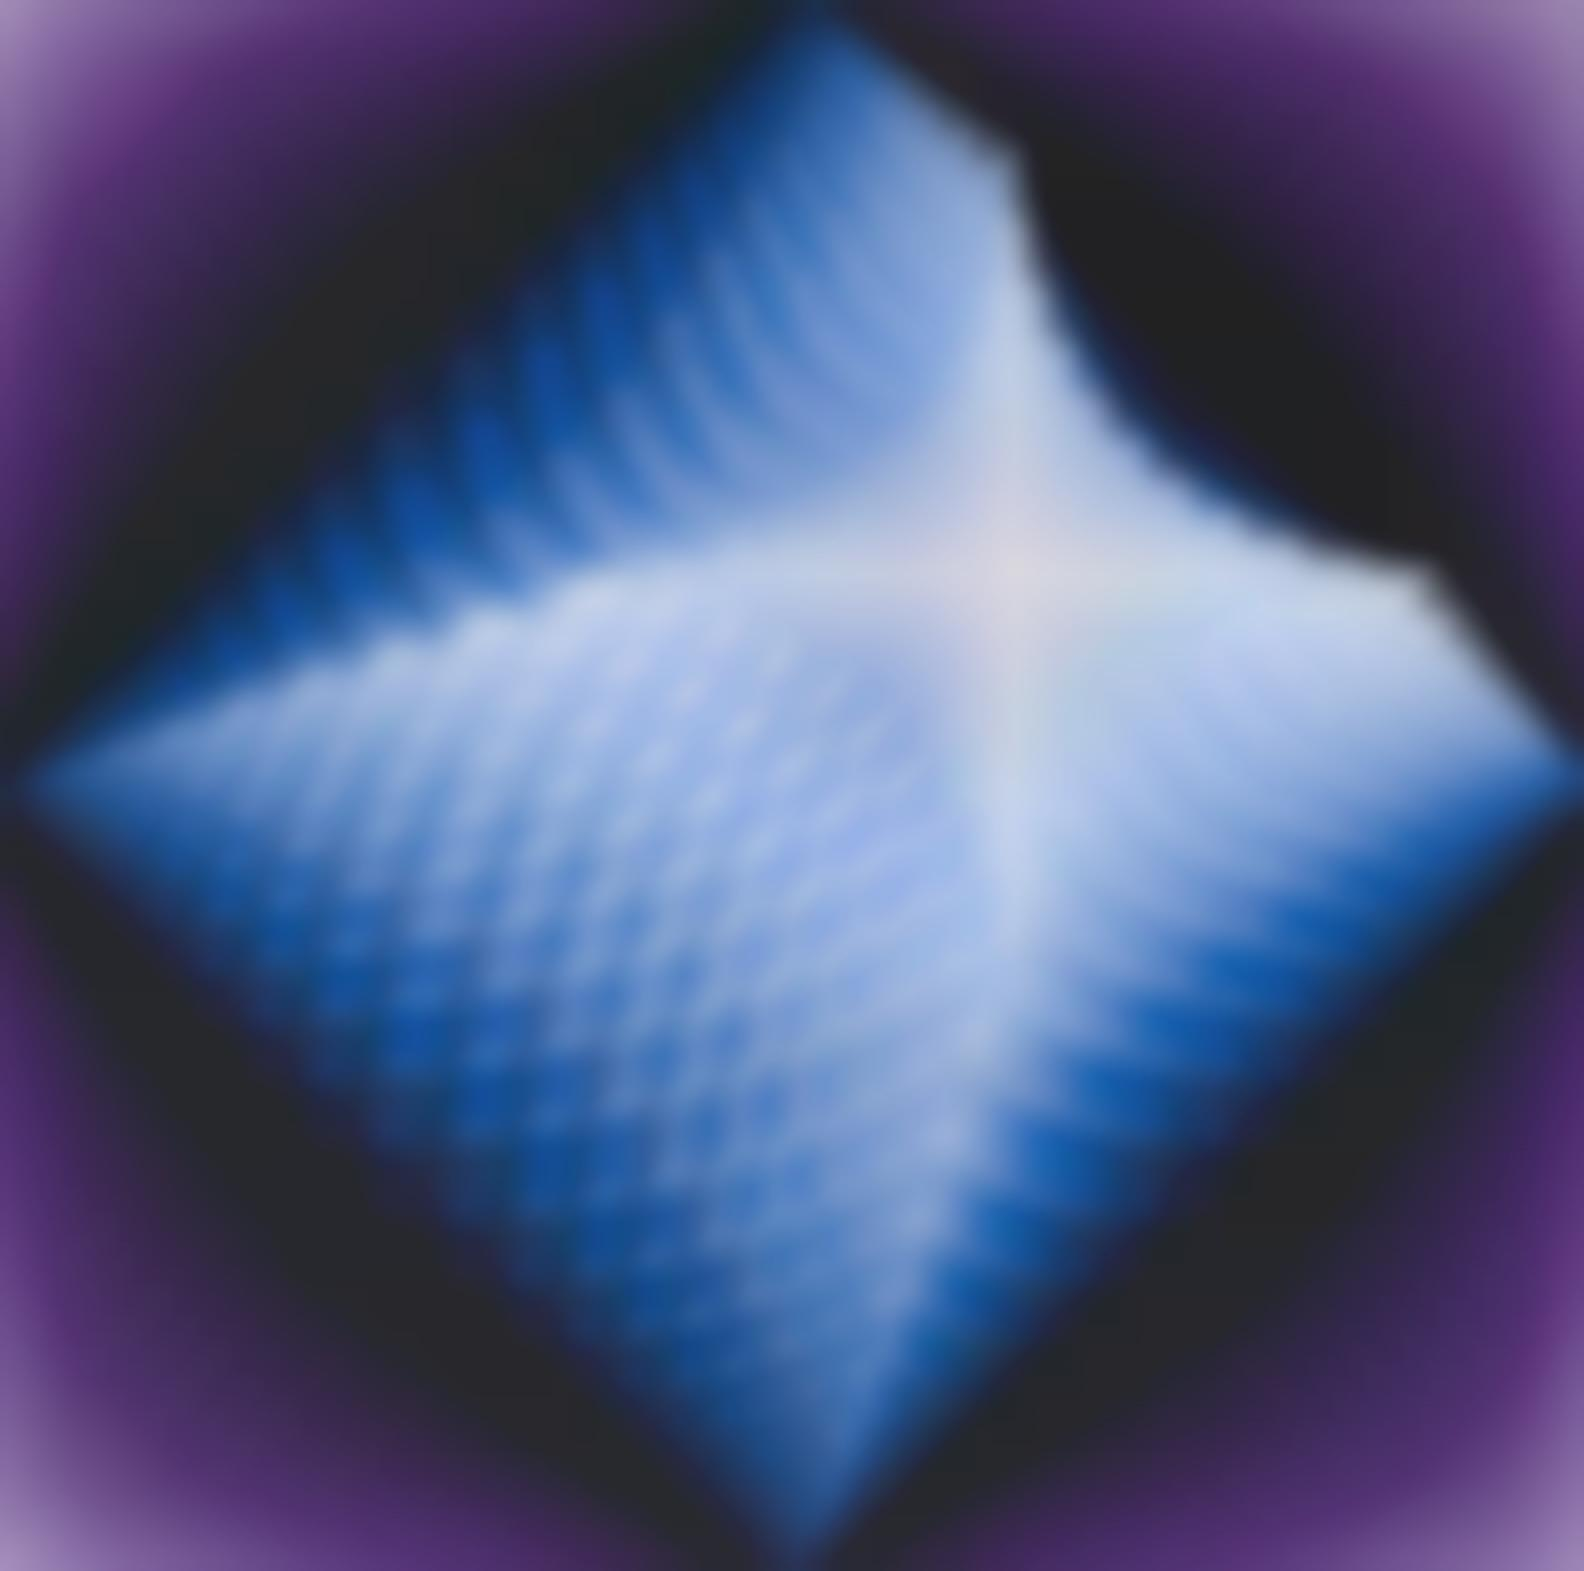 Jean-Pierre Vasarely - Structure Pyramidale Bleu-Violet-1977